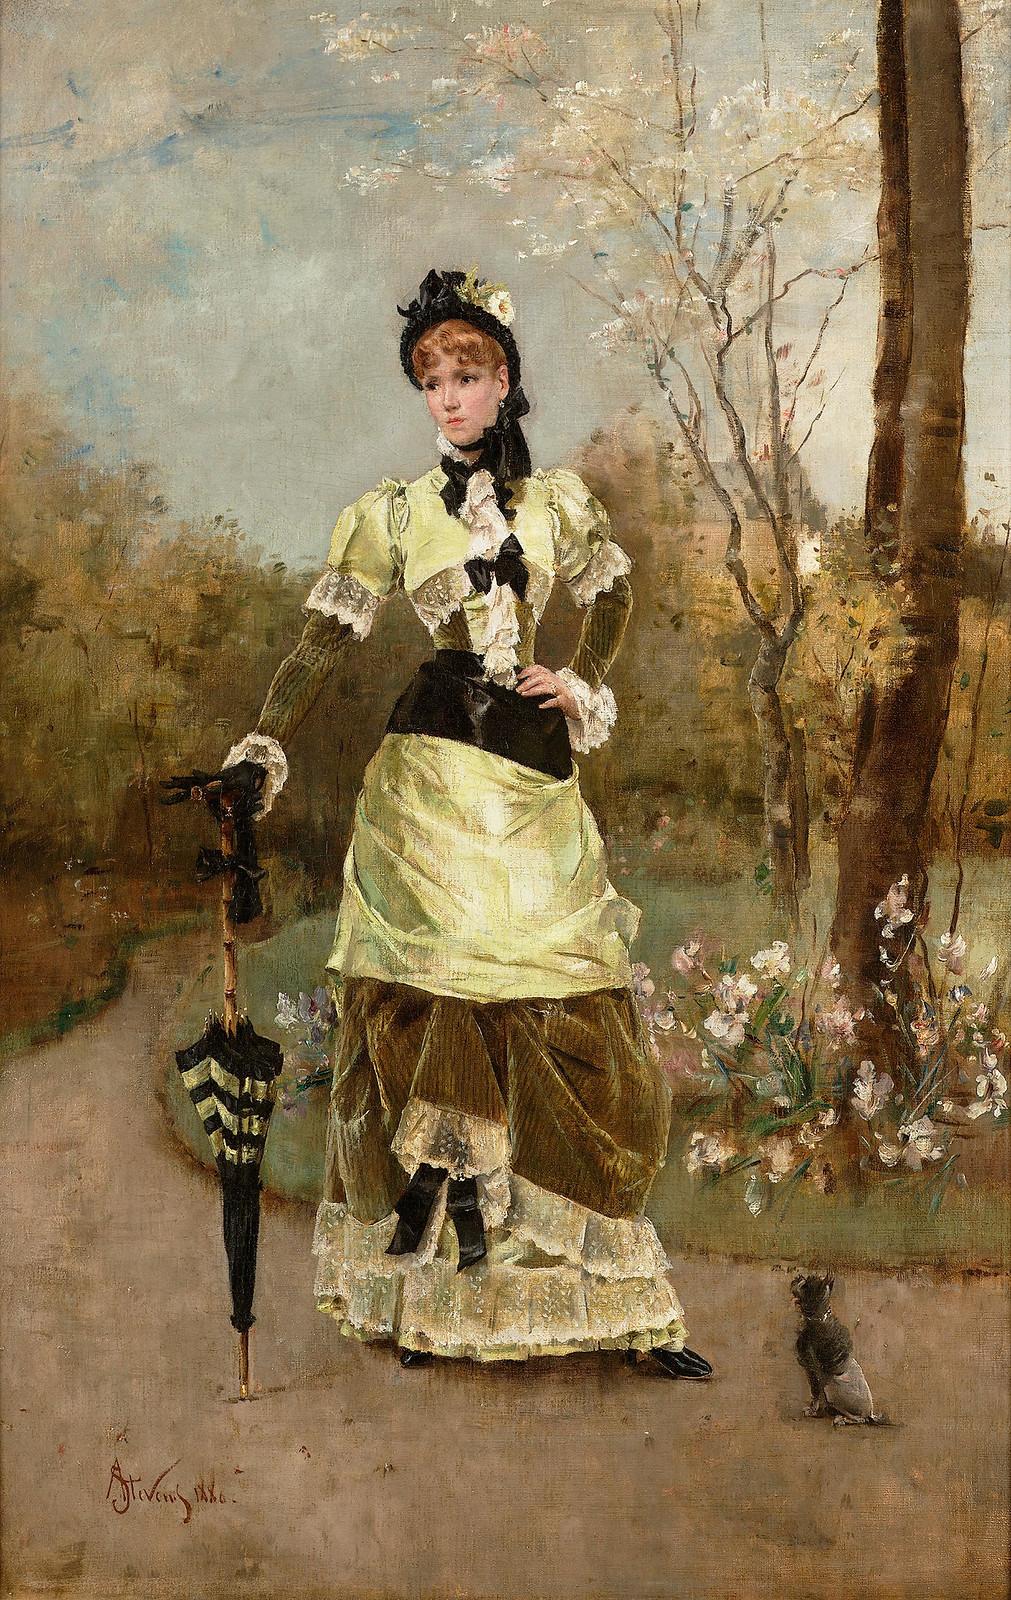 La Parisienne by Alfred Stevens, 1879